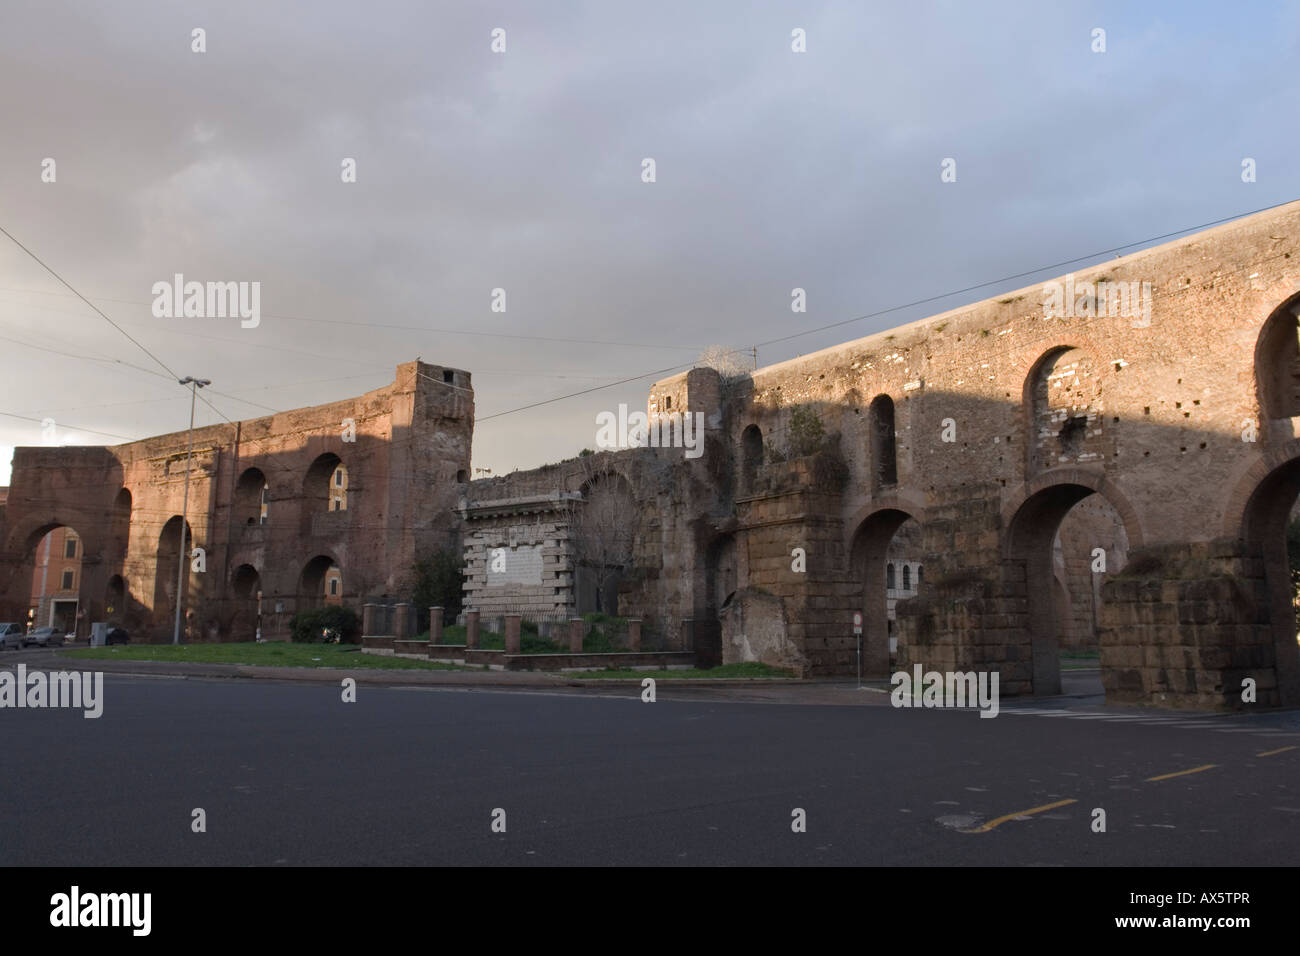 Acquedotto Acqua Marcia.Acquedotto Dell Acqua Marcia Ancient Roman Aqueduct Aqua